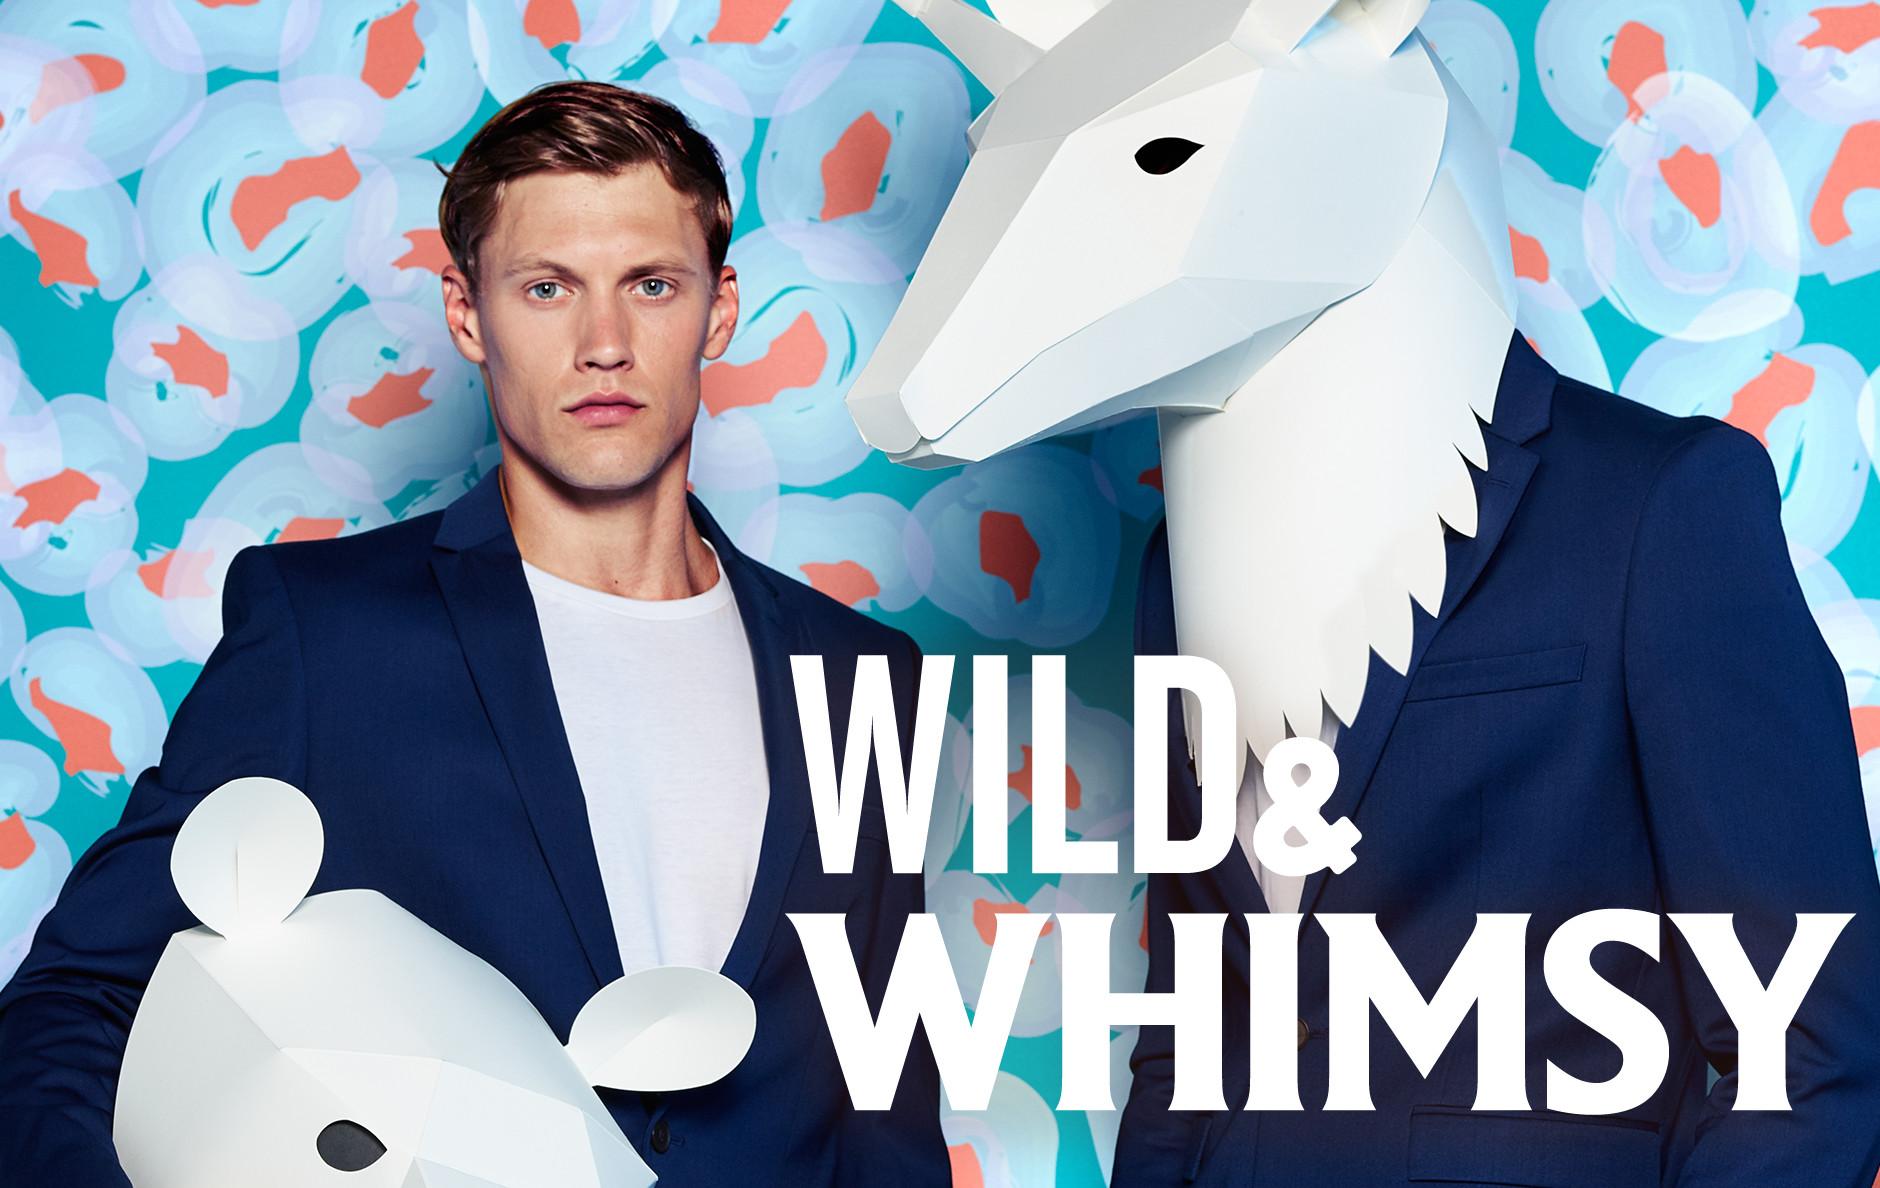 Whimsy&wild